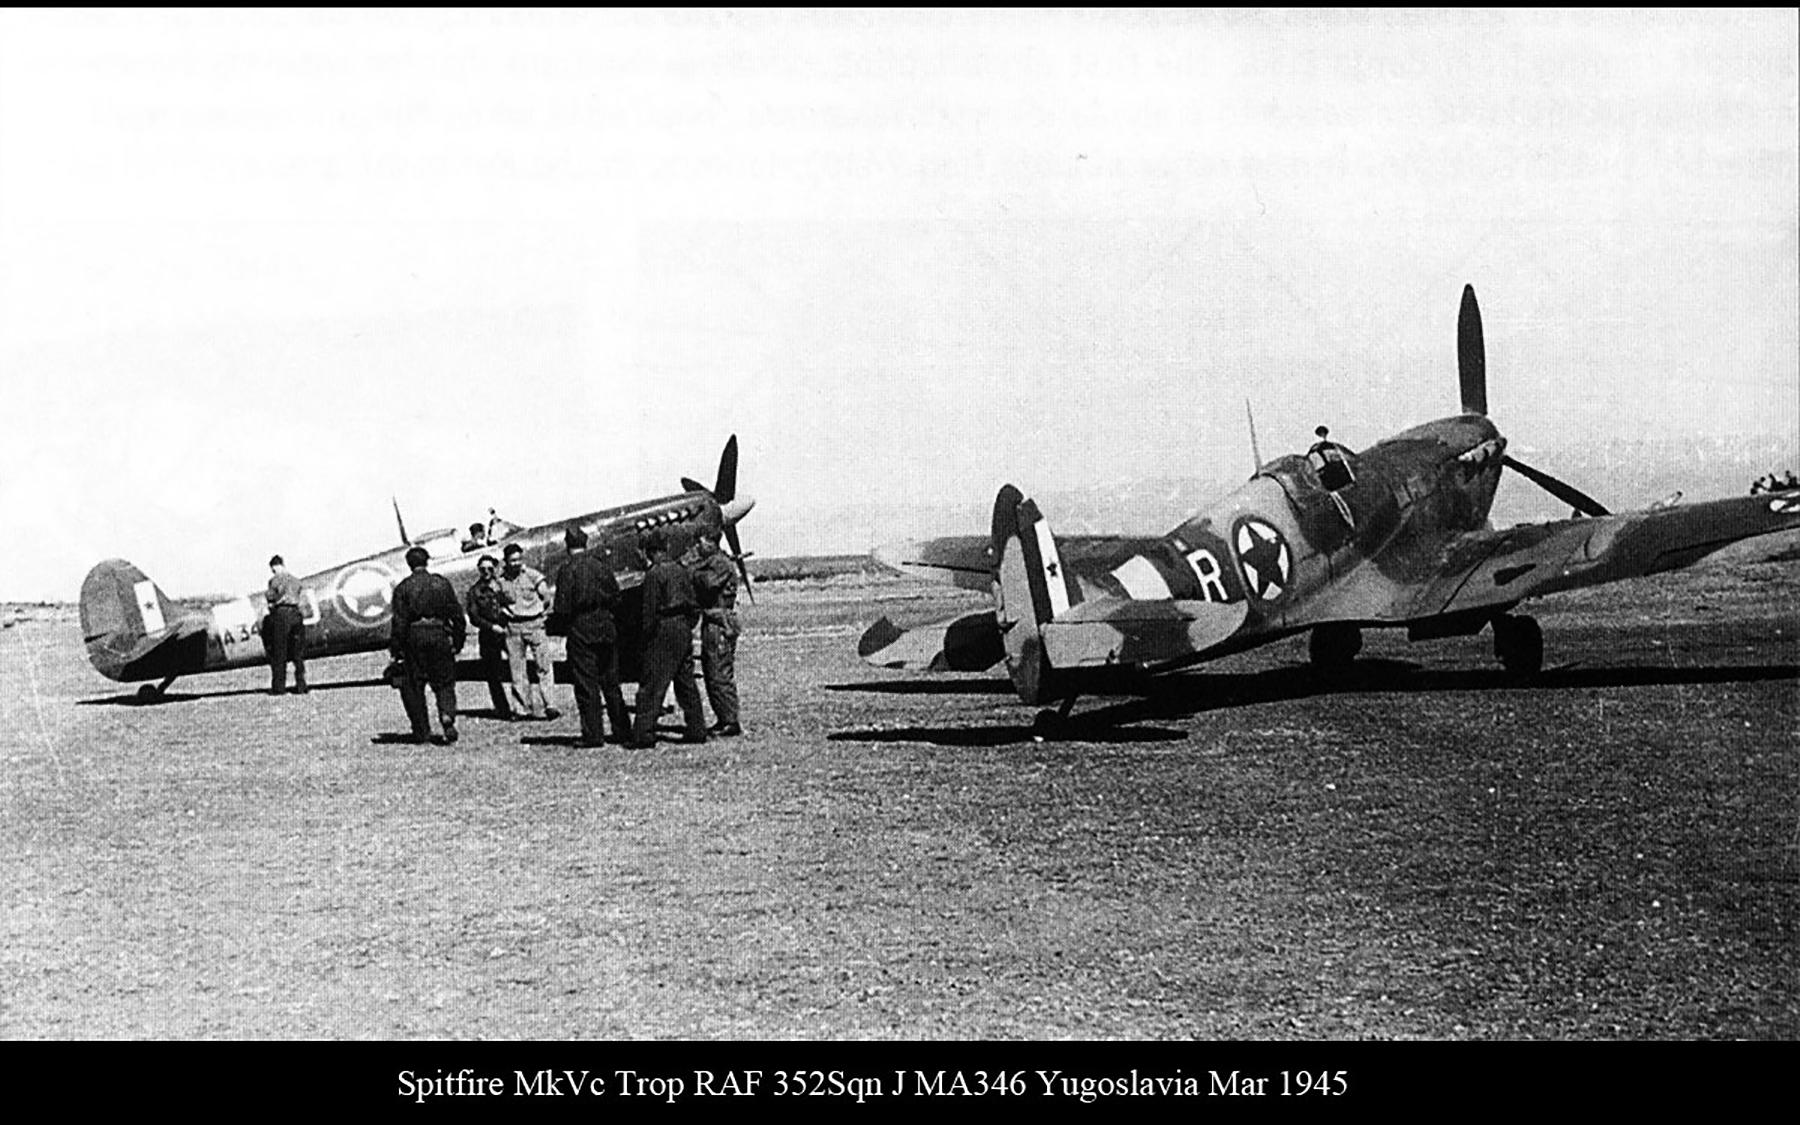 Spitfire MkVcTrop RAF 352Sqn J MA346 Yugoslavia Mar 1945 01